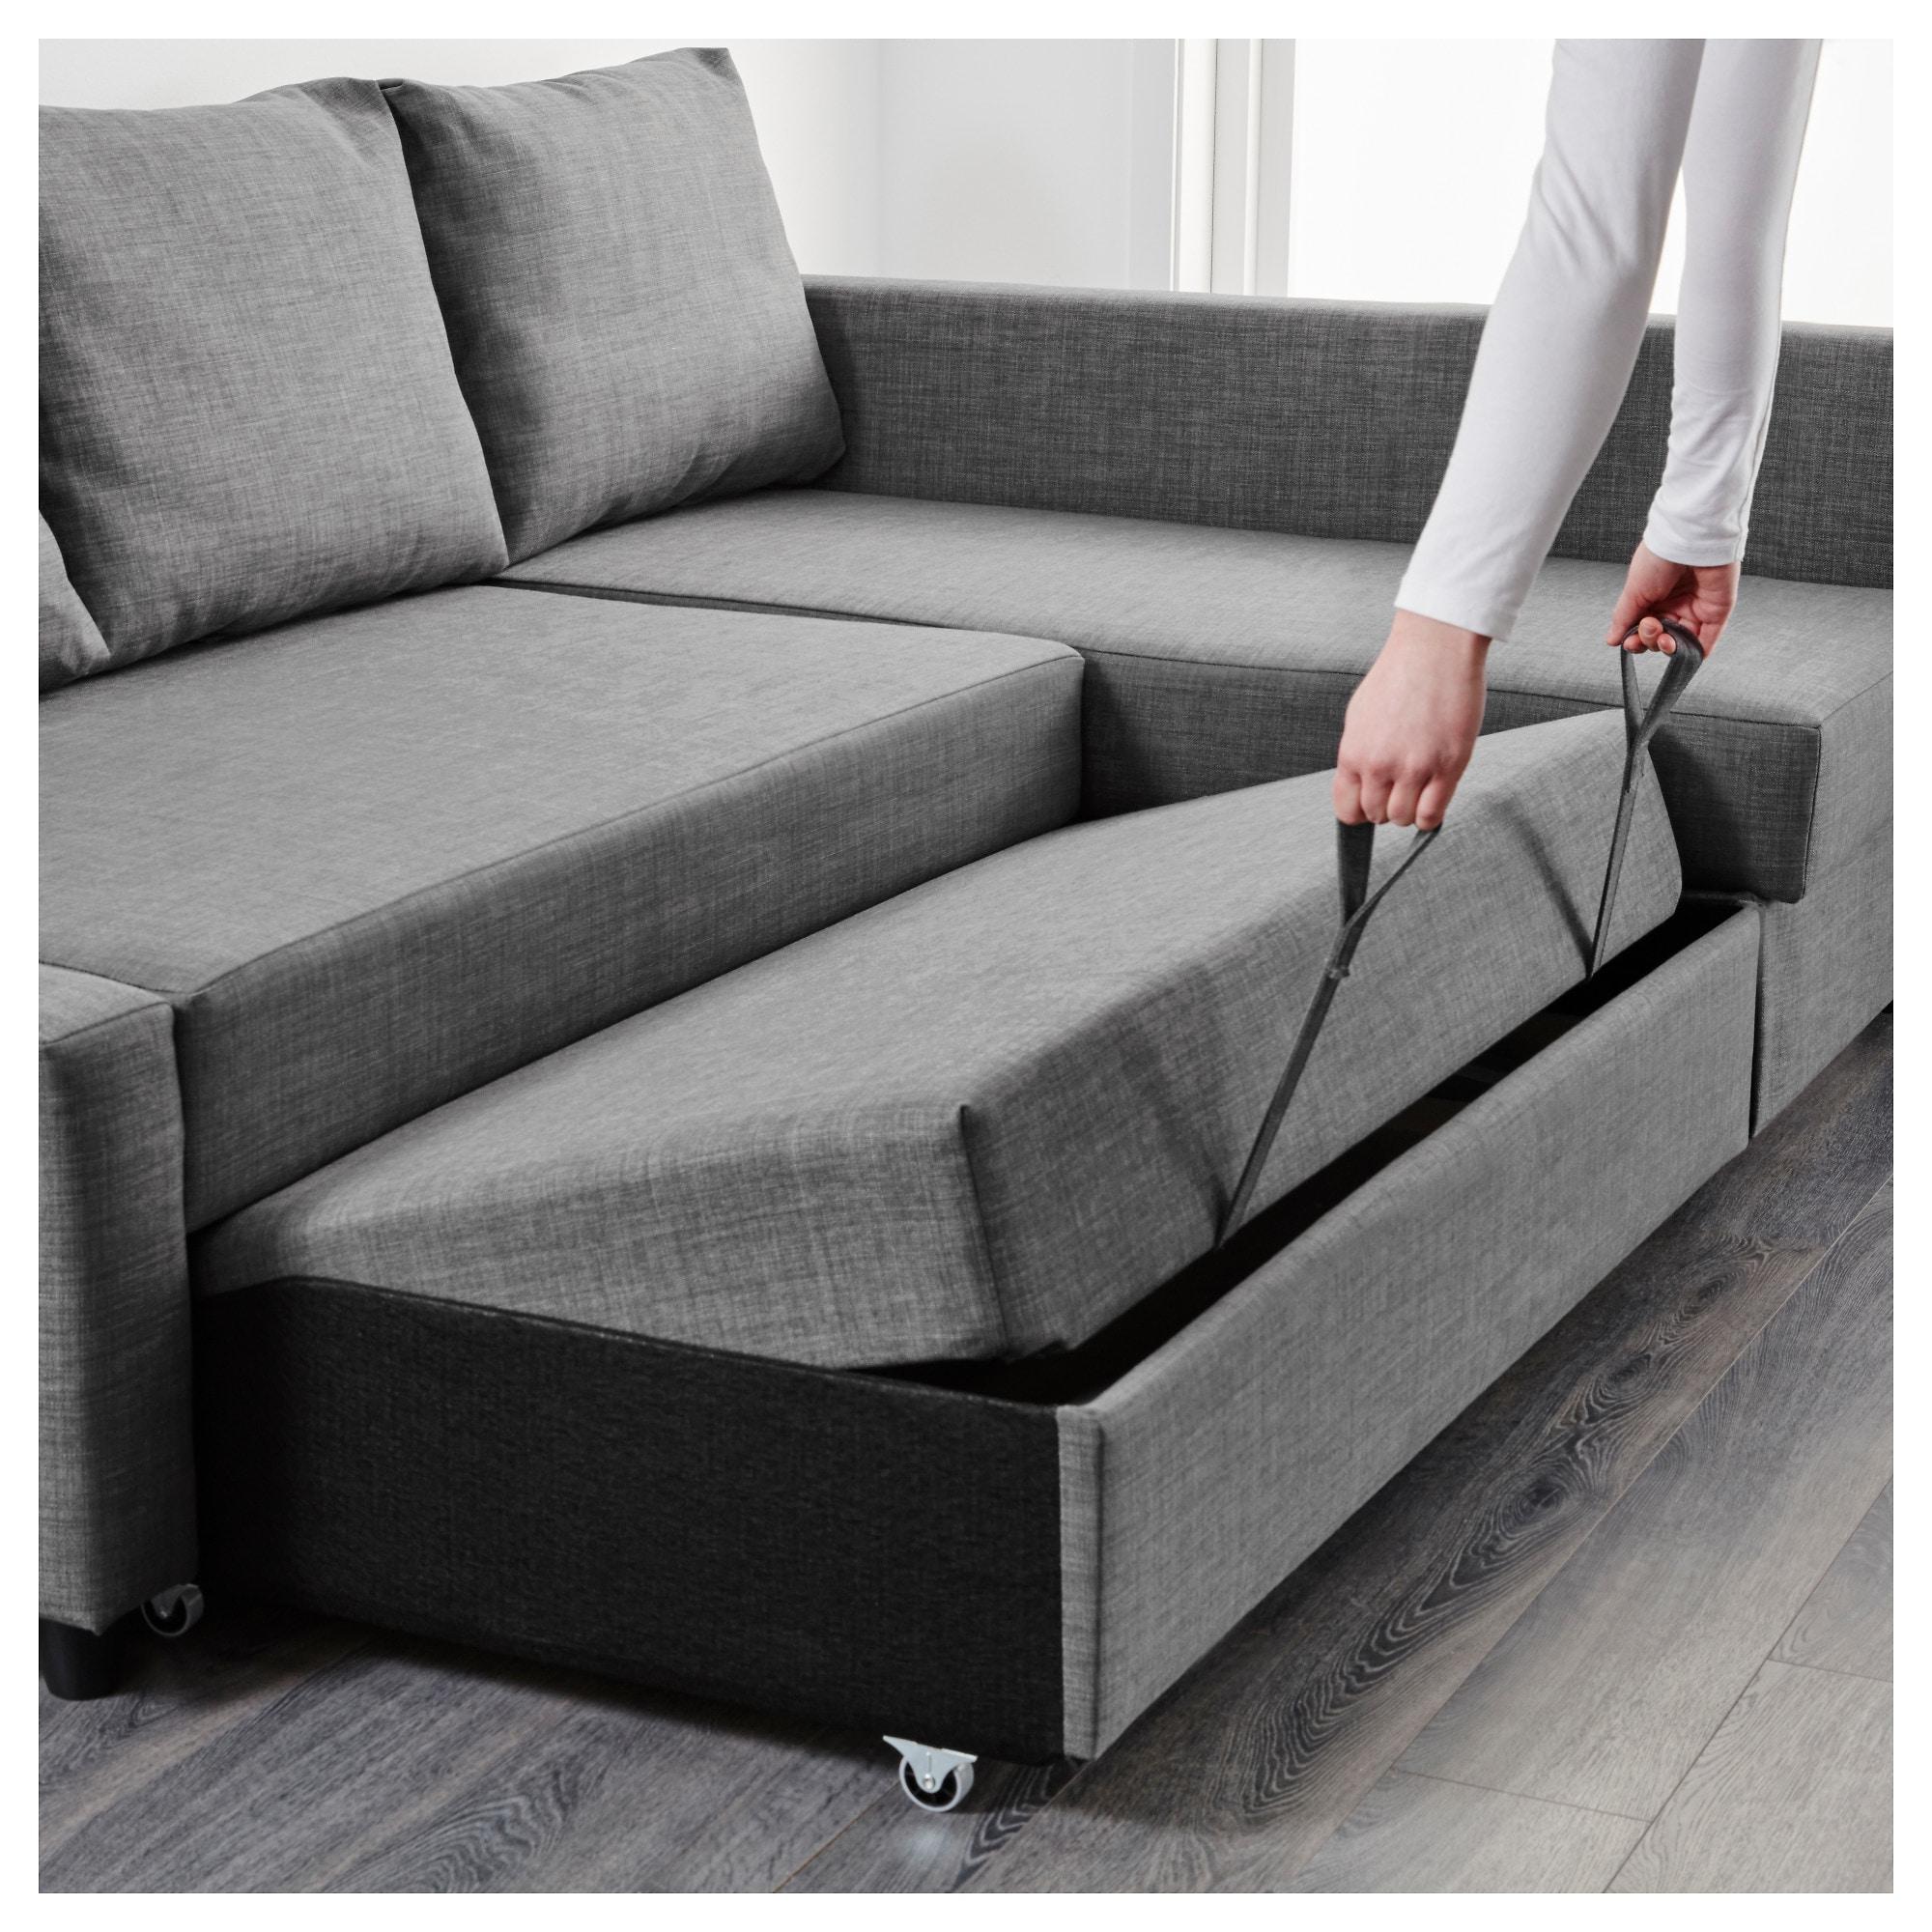 Trendy Friheten Corner Sofa Bed With Storage Skiftebo Dark Grey – Ikea Intended For Ikea Sofa Chairs (View 18 of 20)